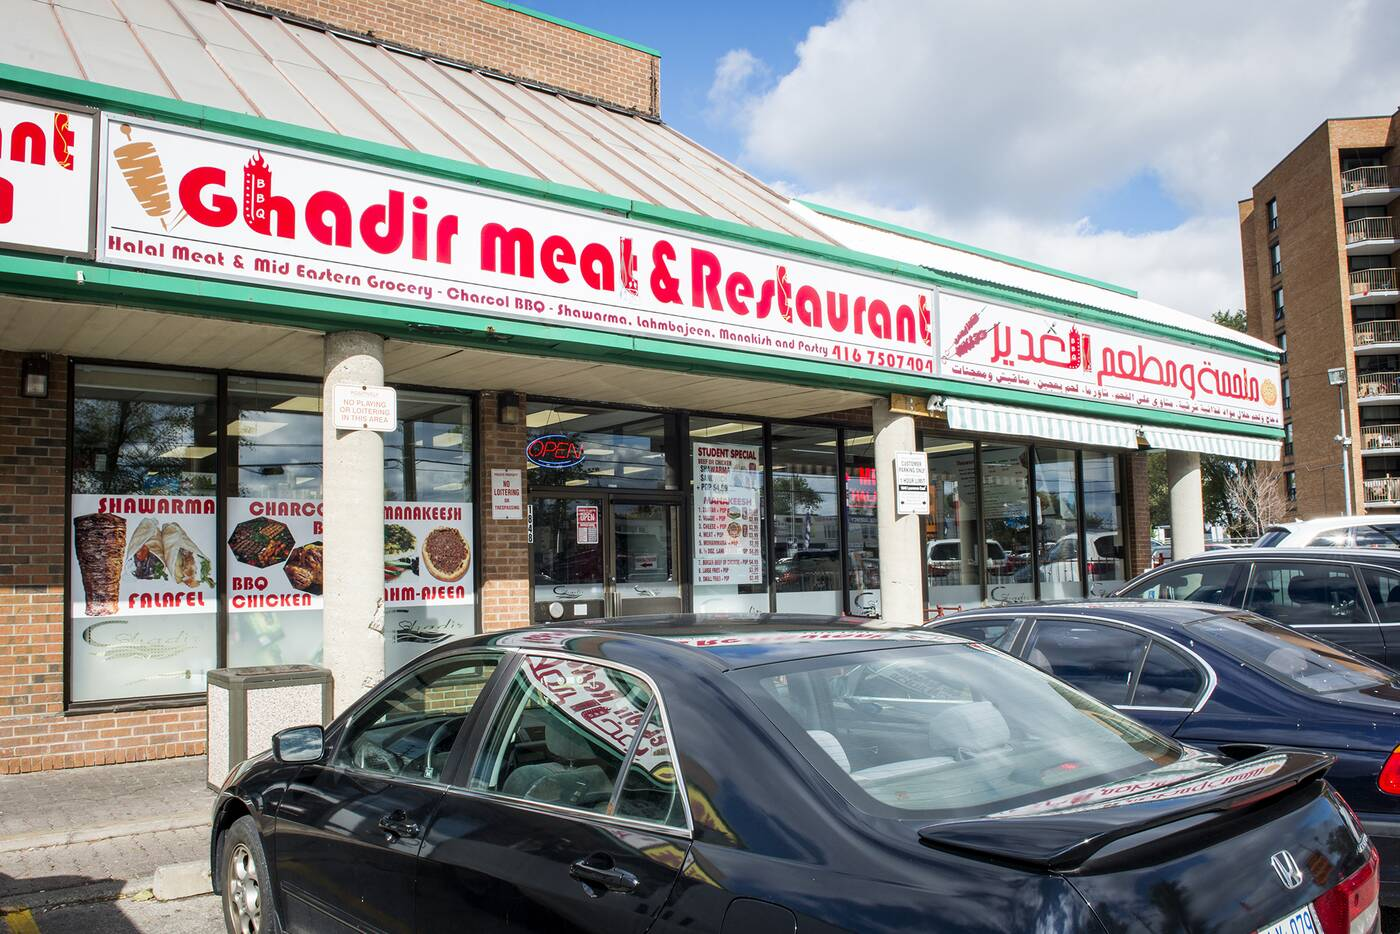 Ghadir Toronto